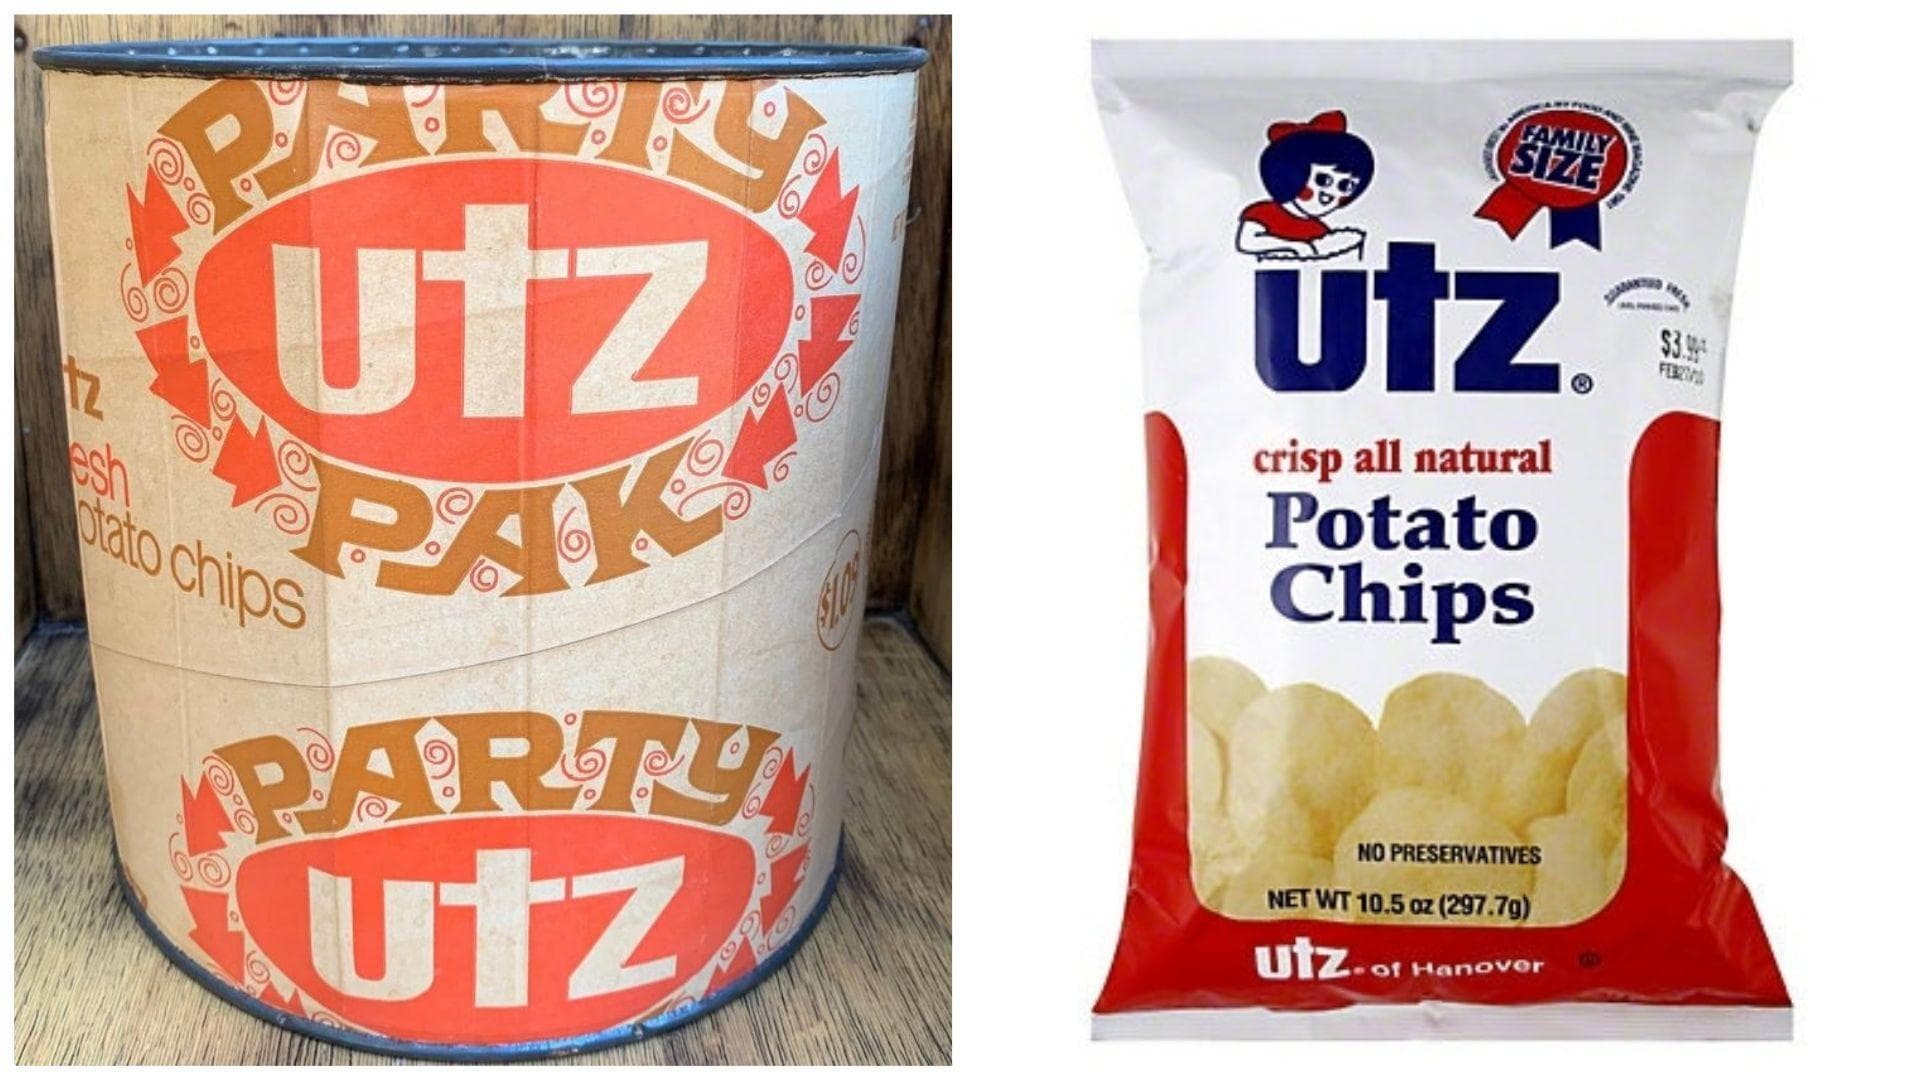 Utz Potato Chips, C. 1960s Vs. 2019 on Random Potato Chip Bags Have Changed Over Tim